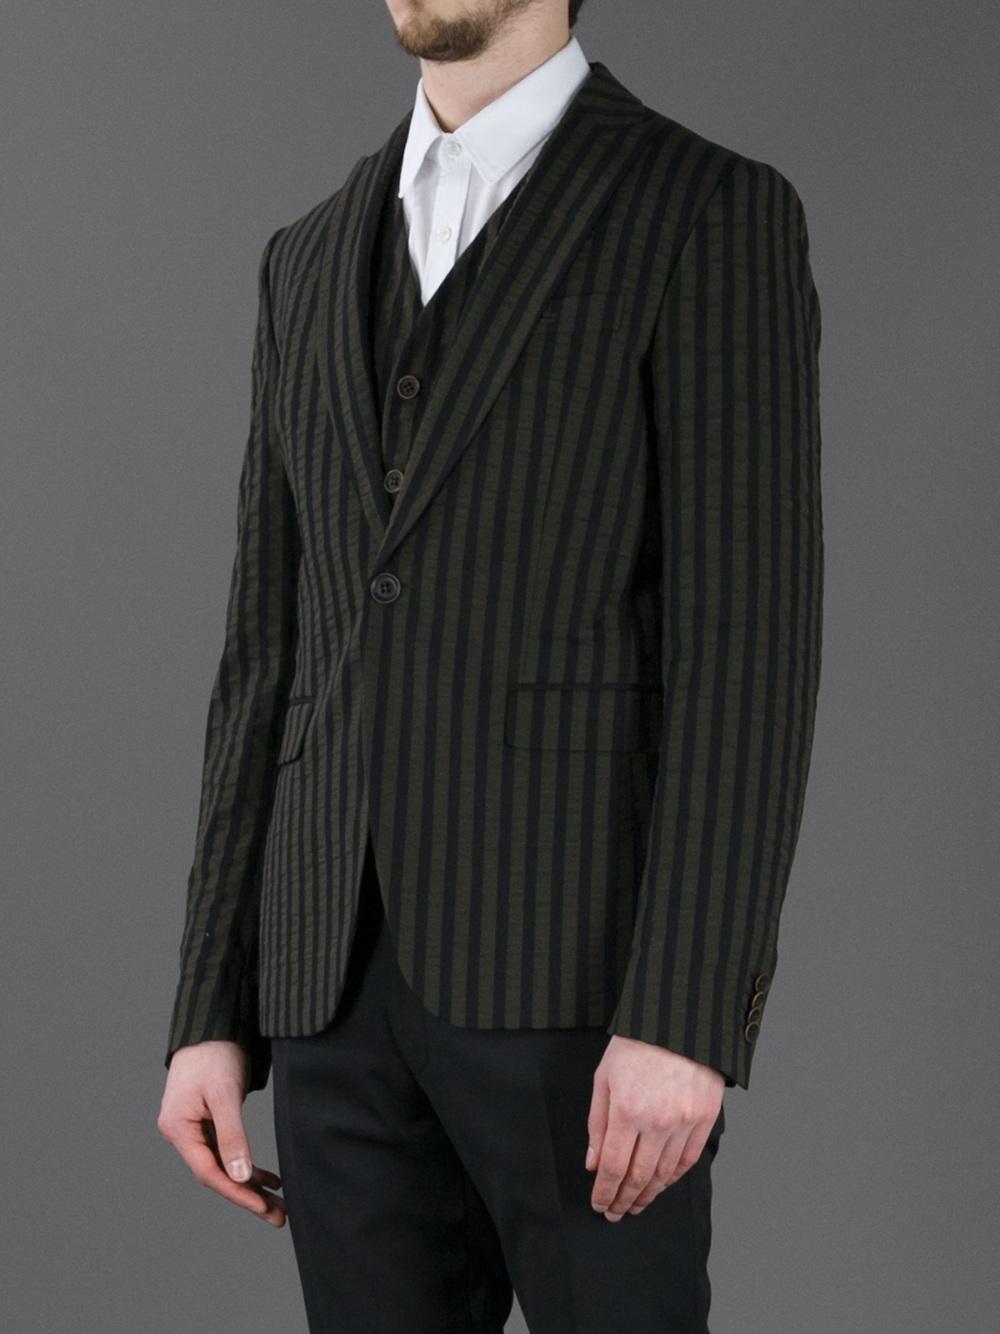 1544fe3e97 Lyst - Diesel Black Gold Striped Blazer in Natural for Men